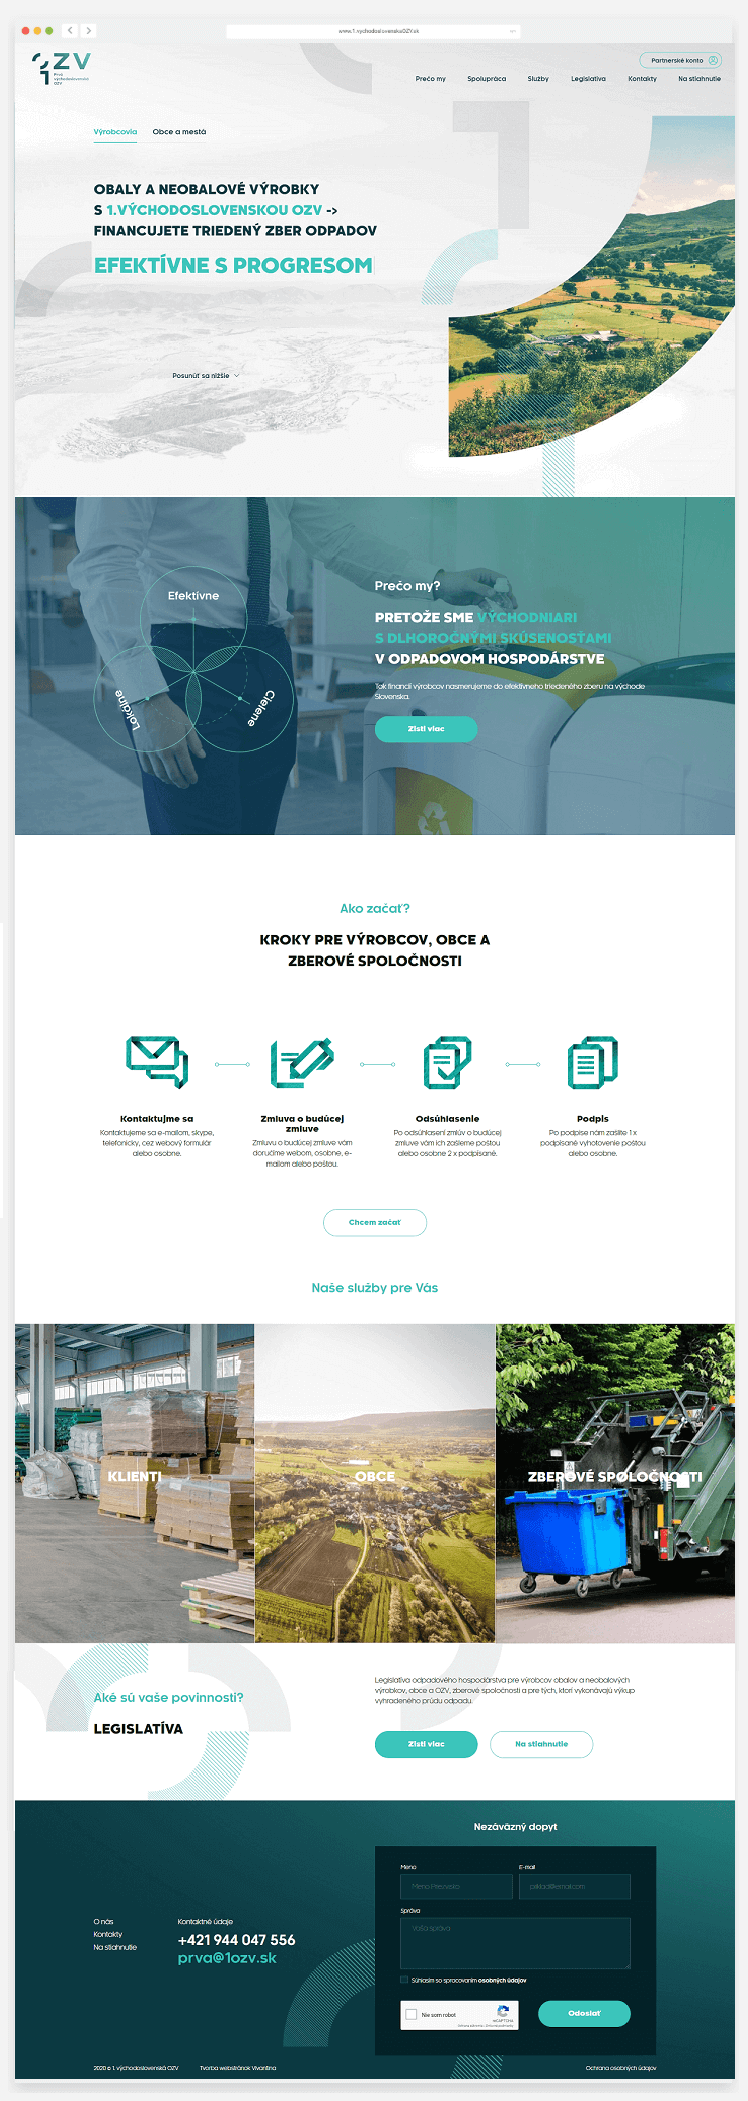 1ozv_landing page